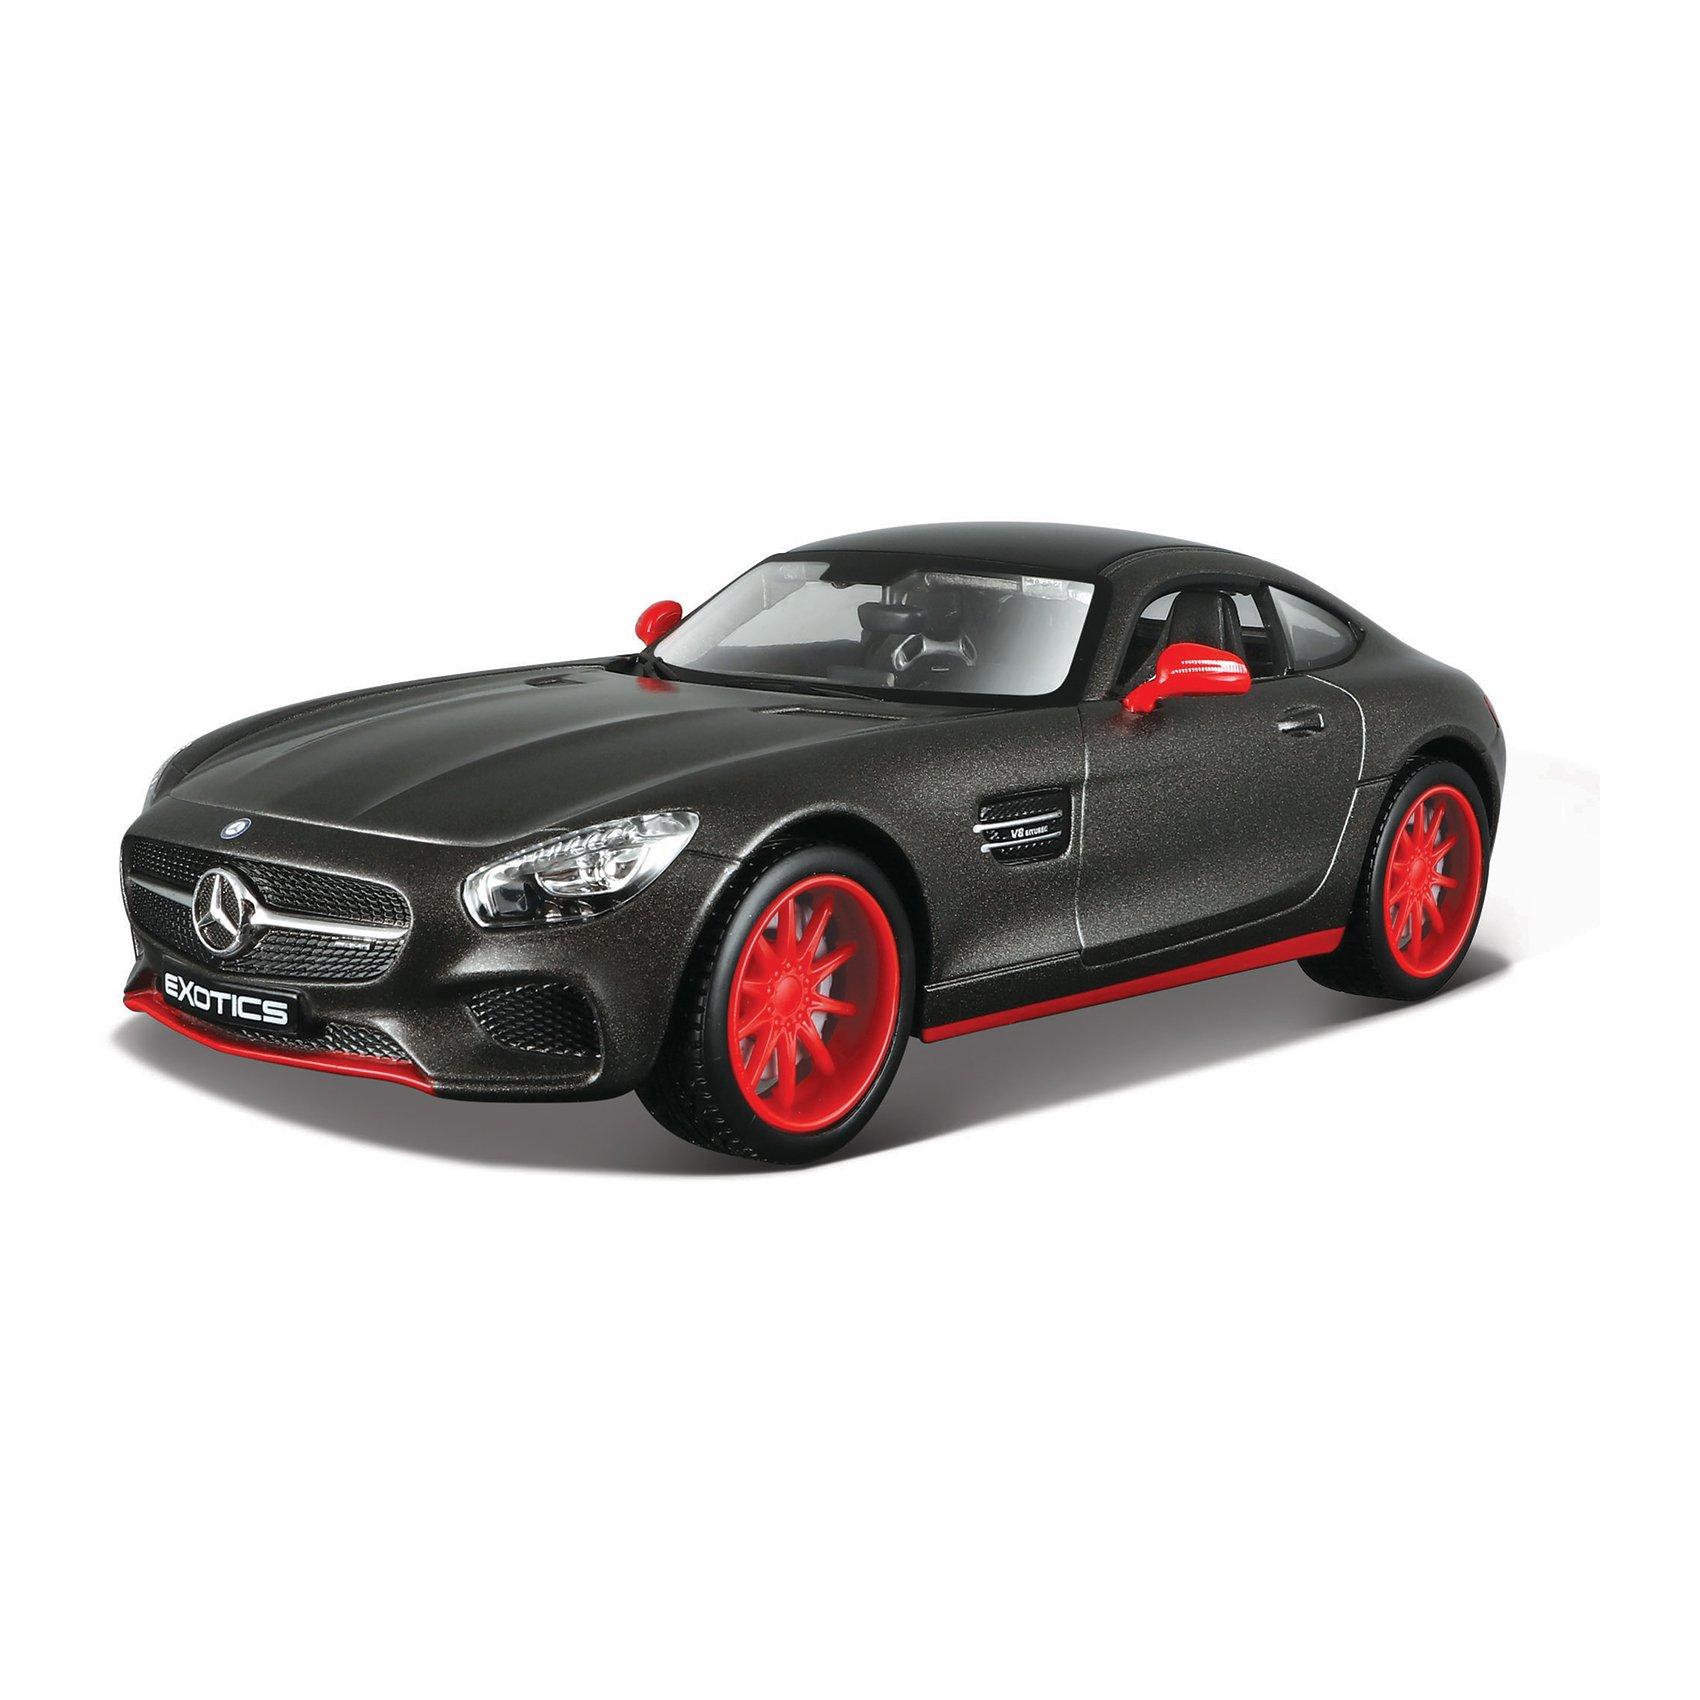 Masinuta Maisto Mercedes AMG GT 1:24